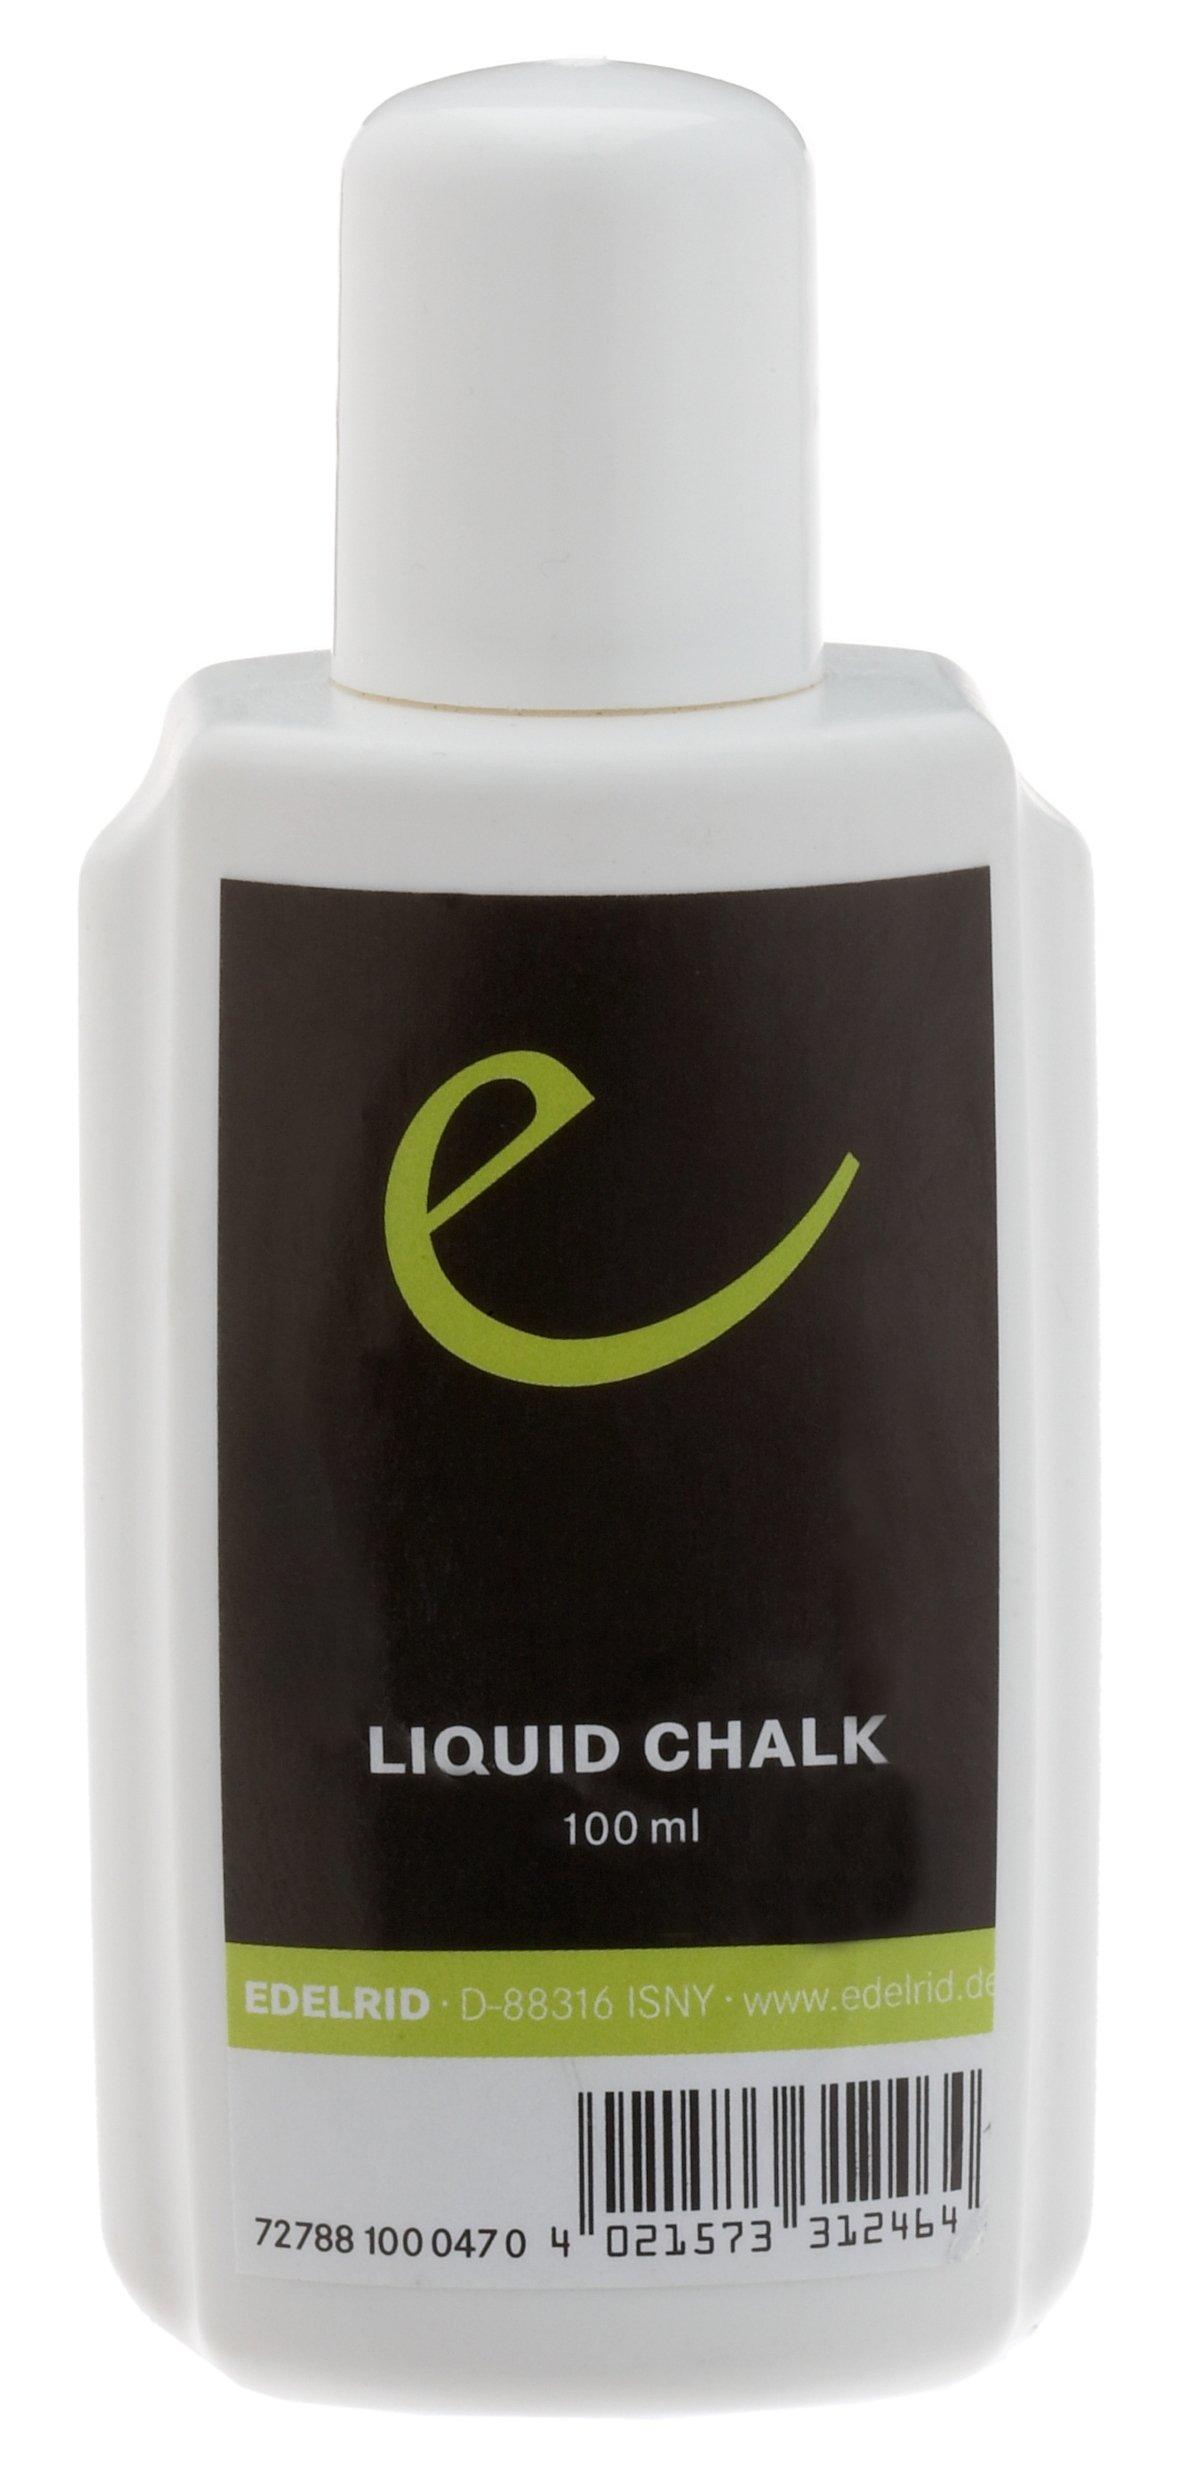 EDELRID Liquid Chalk snow